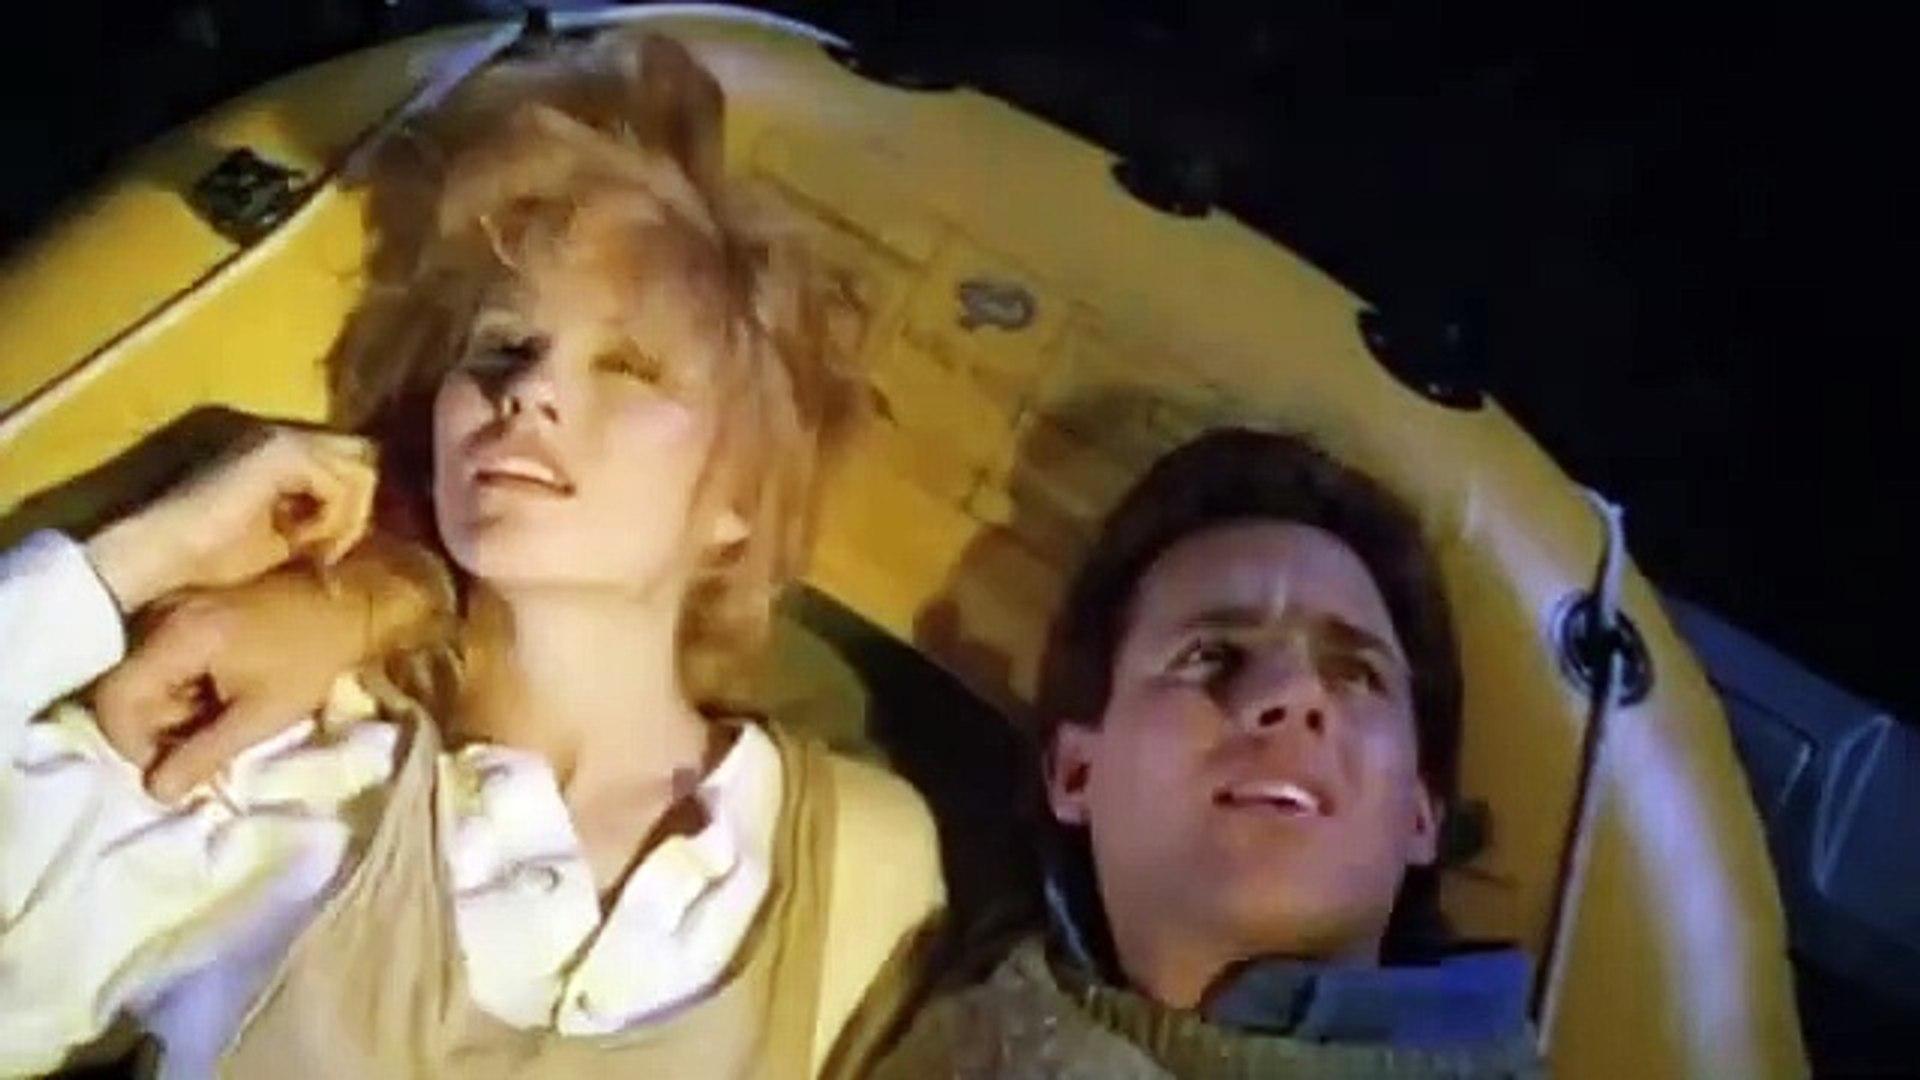 Killer Klowns from Outer Space Movie (1988) Grant Cramer, Suzanne Snyder, John Allen Nelson